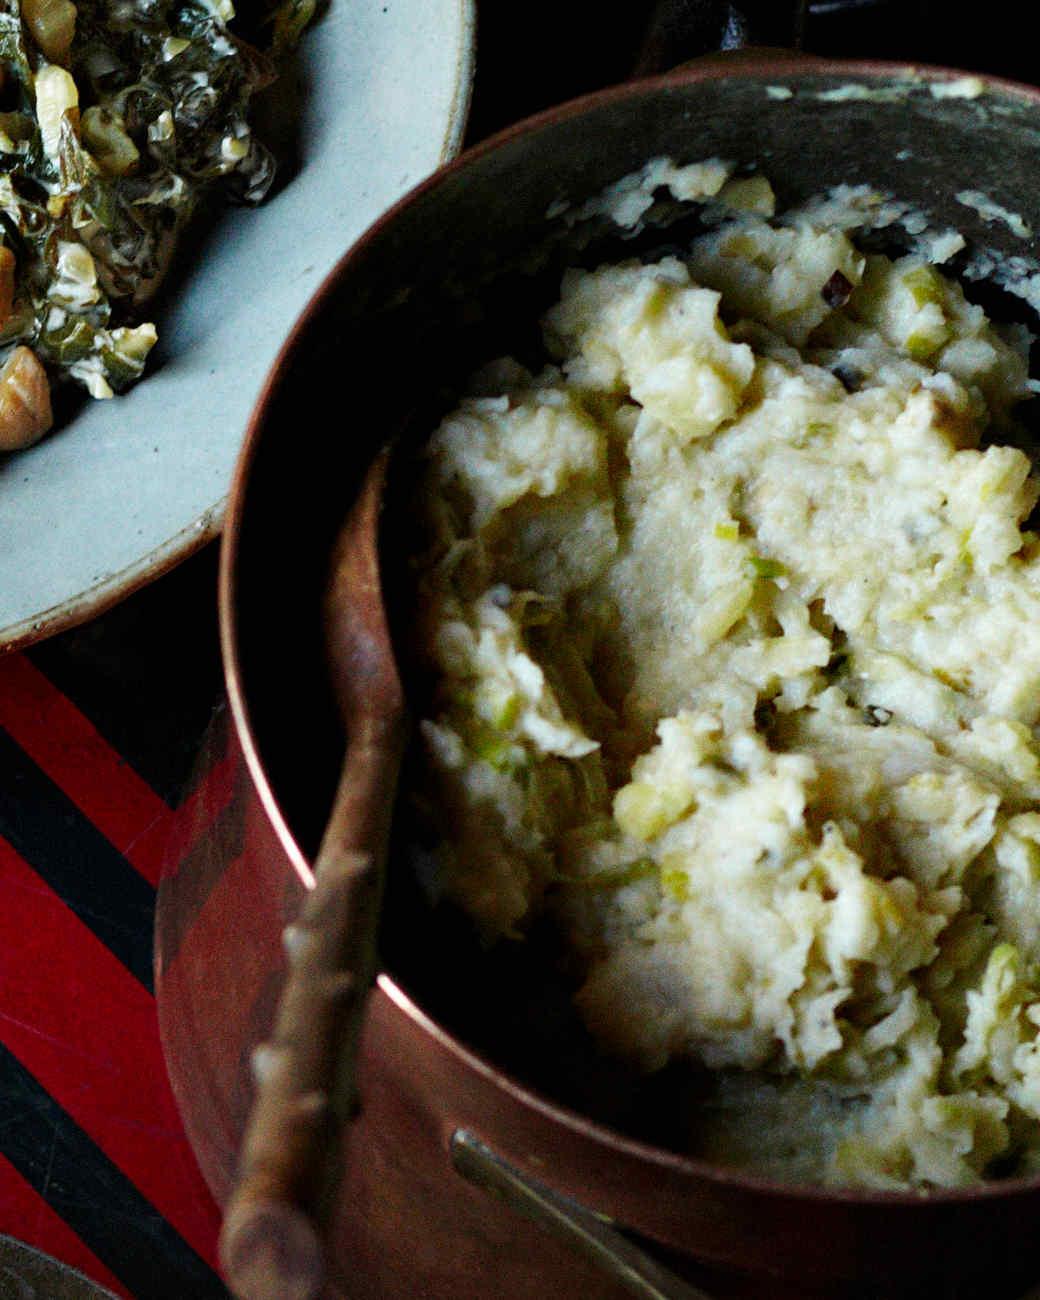 Smashed Root Vegetables and Caramelized Leeks